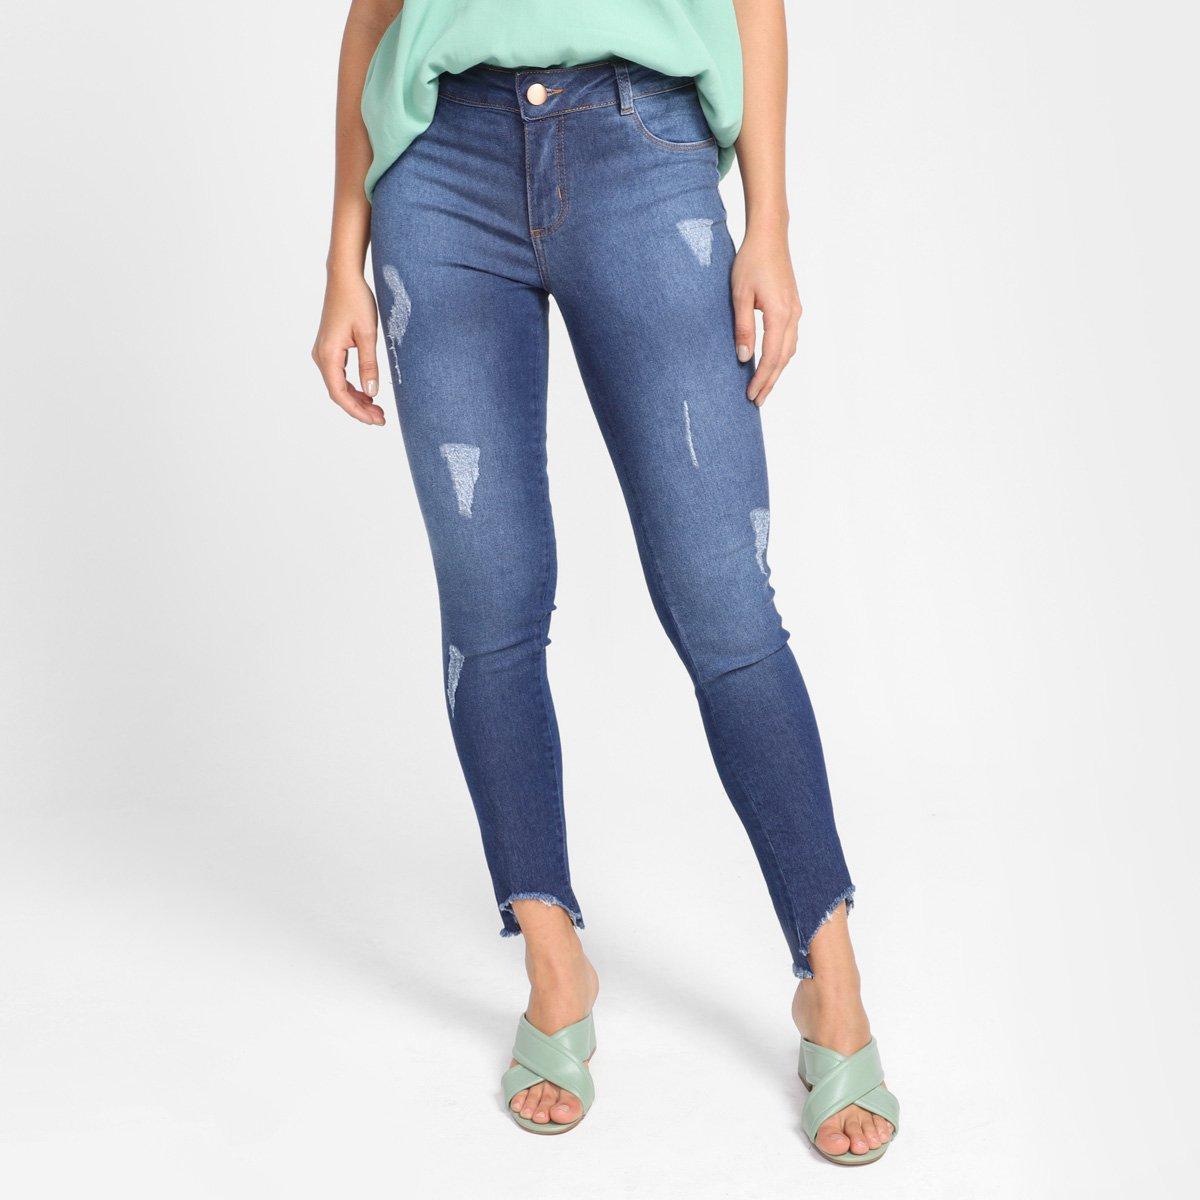 Calça Jeans Skinny Grifle Assimétrica Cintura Média Feminina